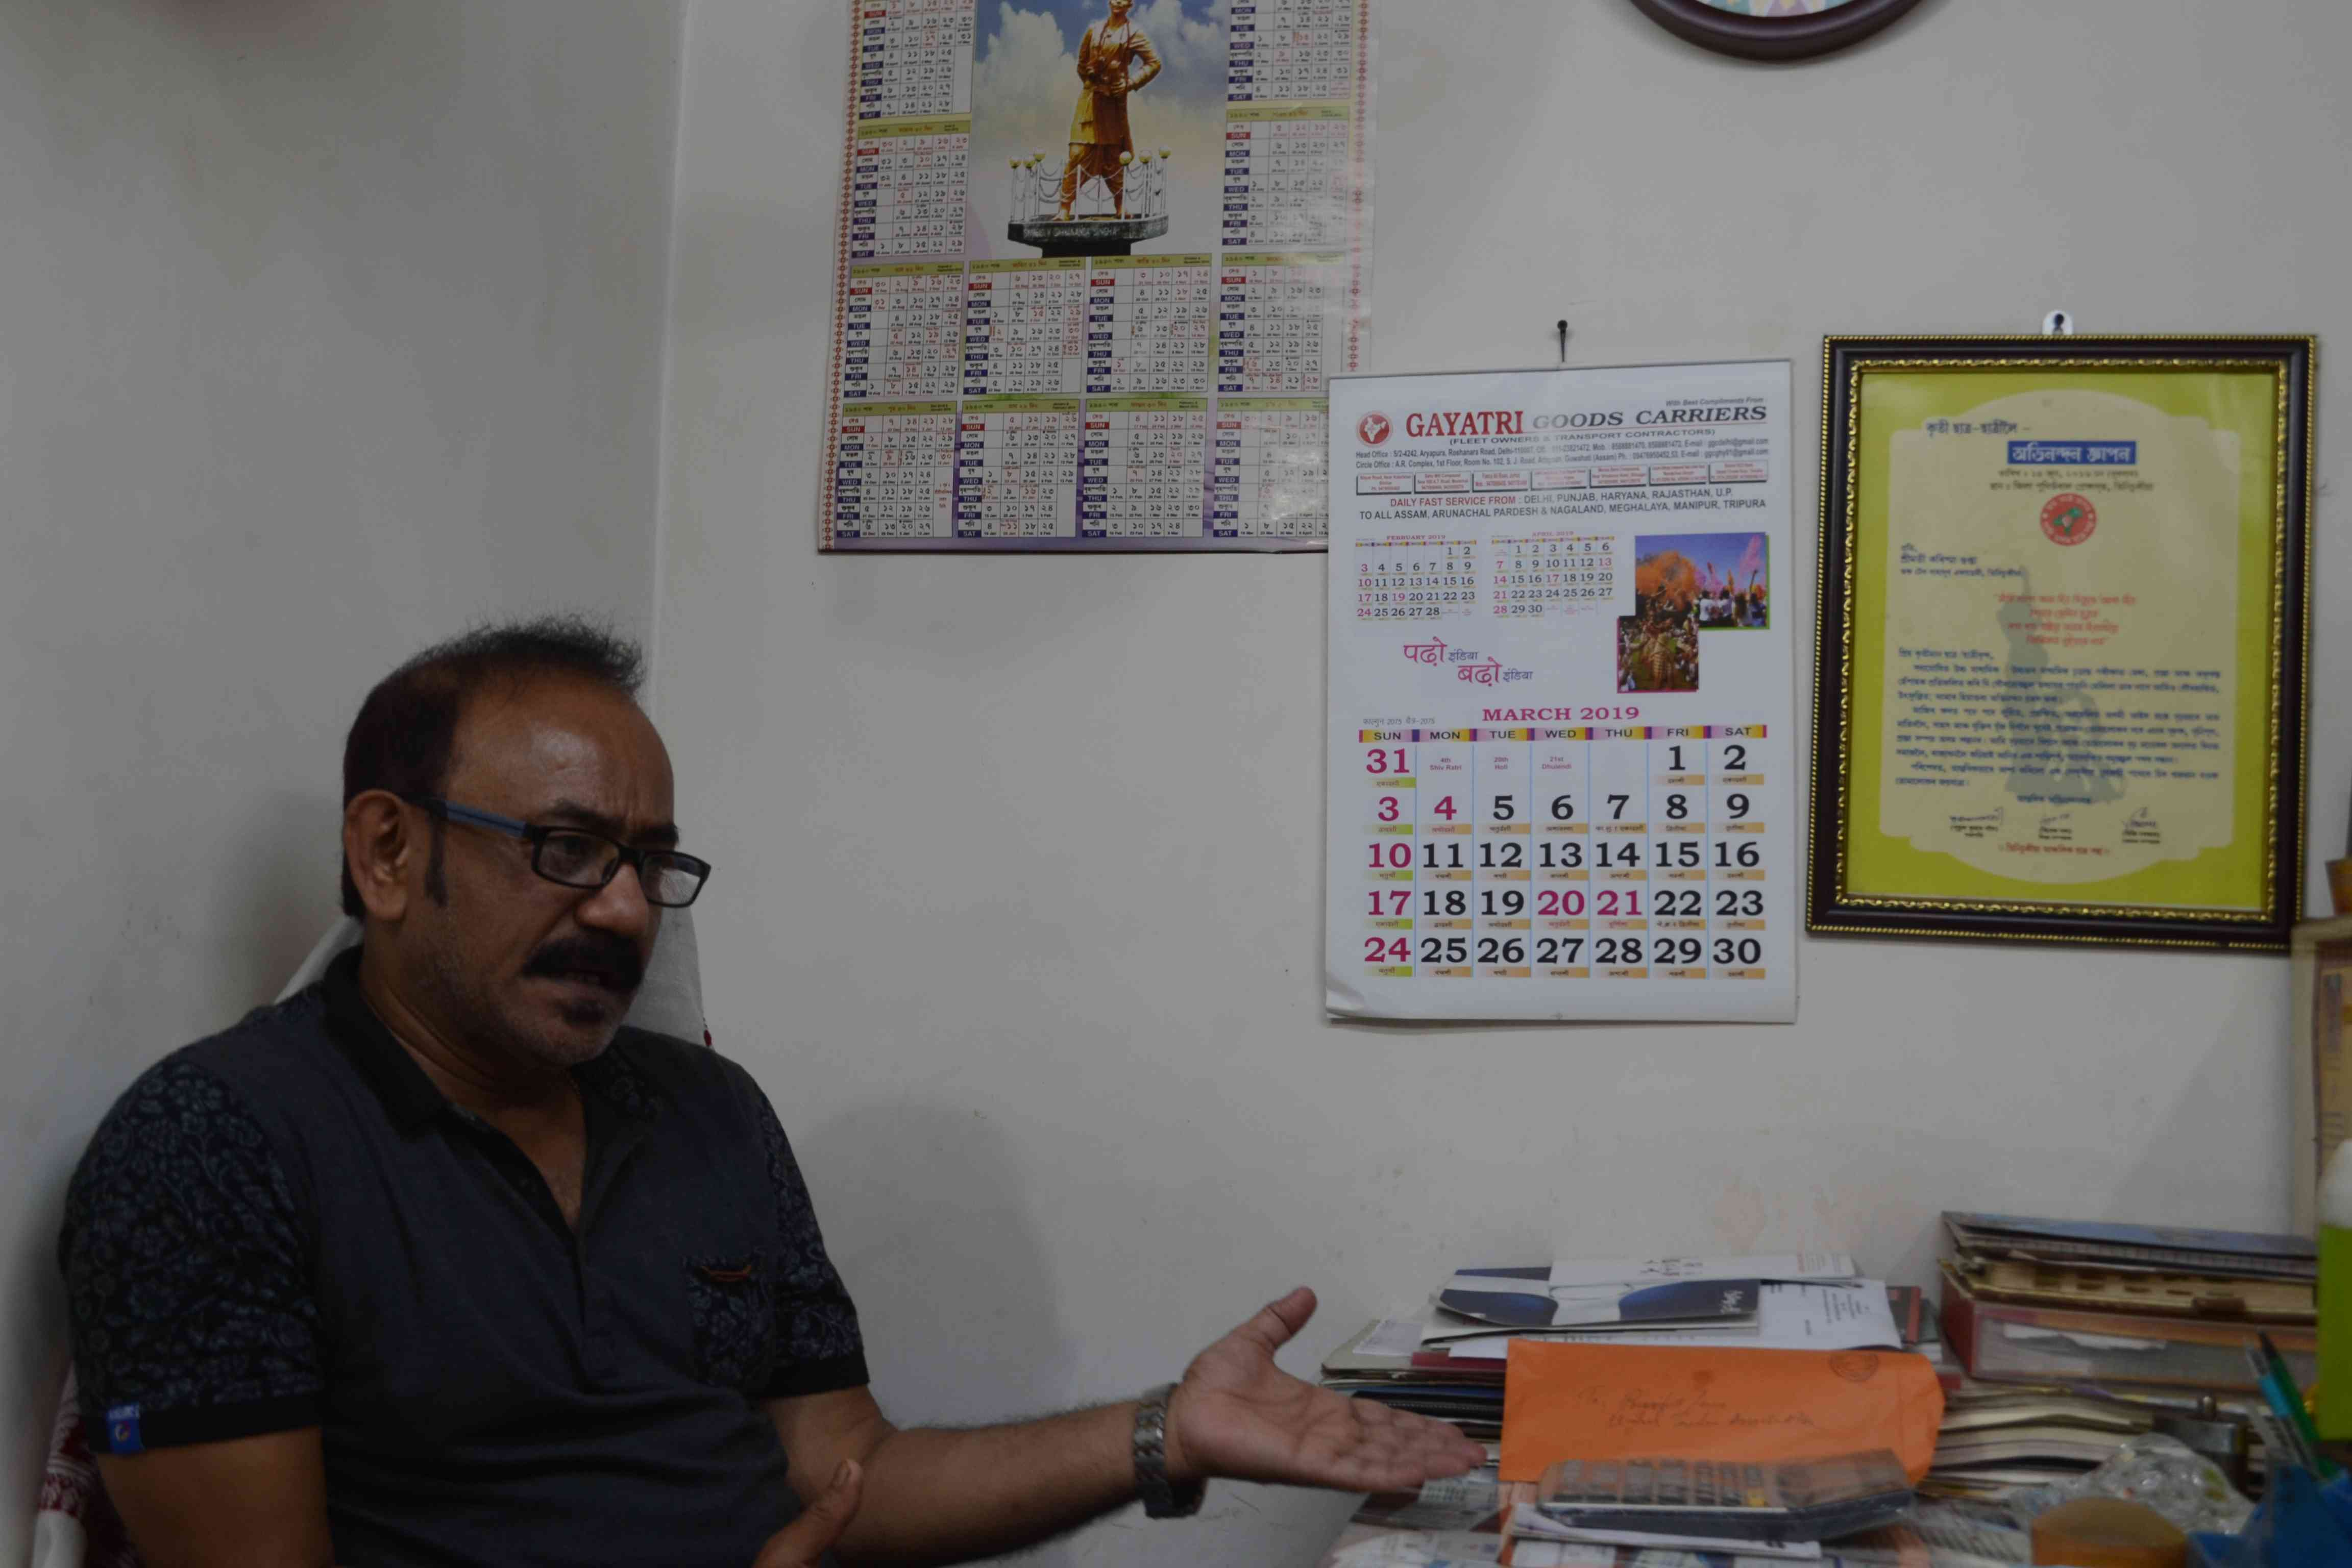 Dilip Gupta is a retailer in Tinsukia. Photo credit: Anupam Chakravartty